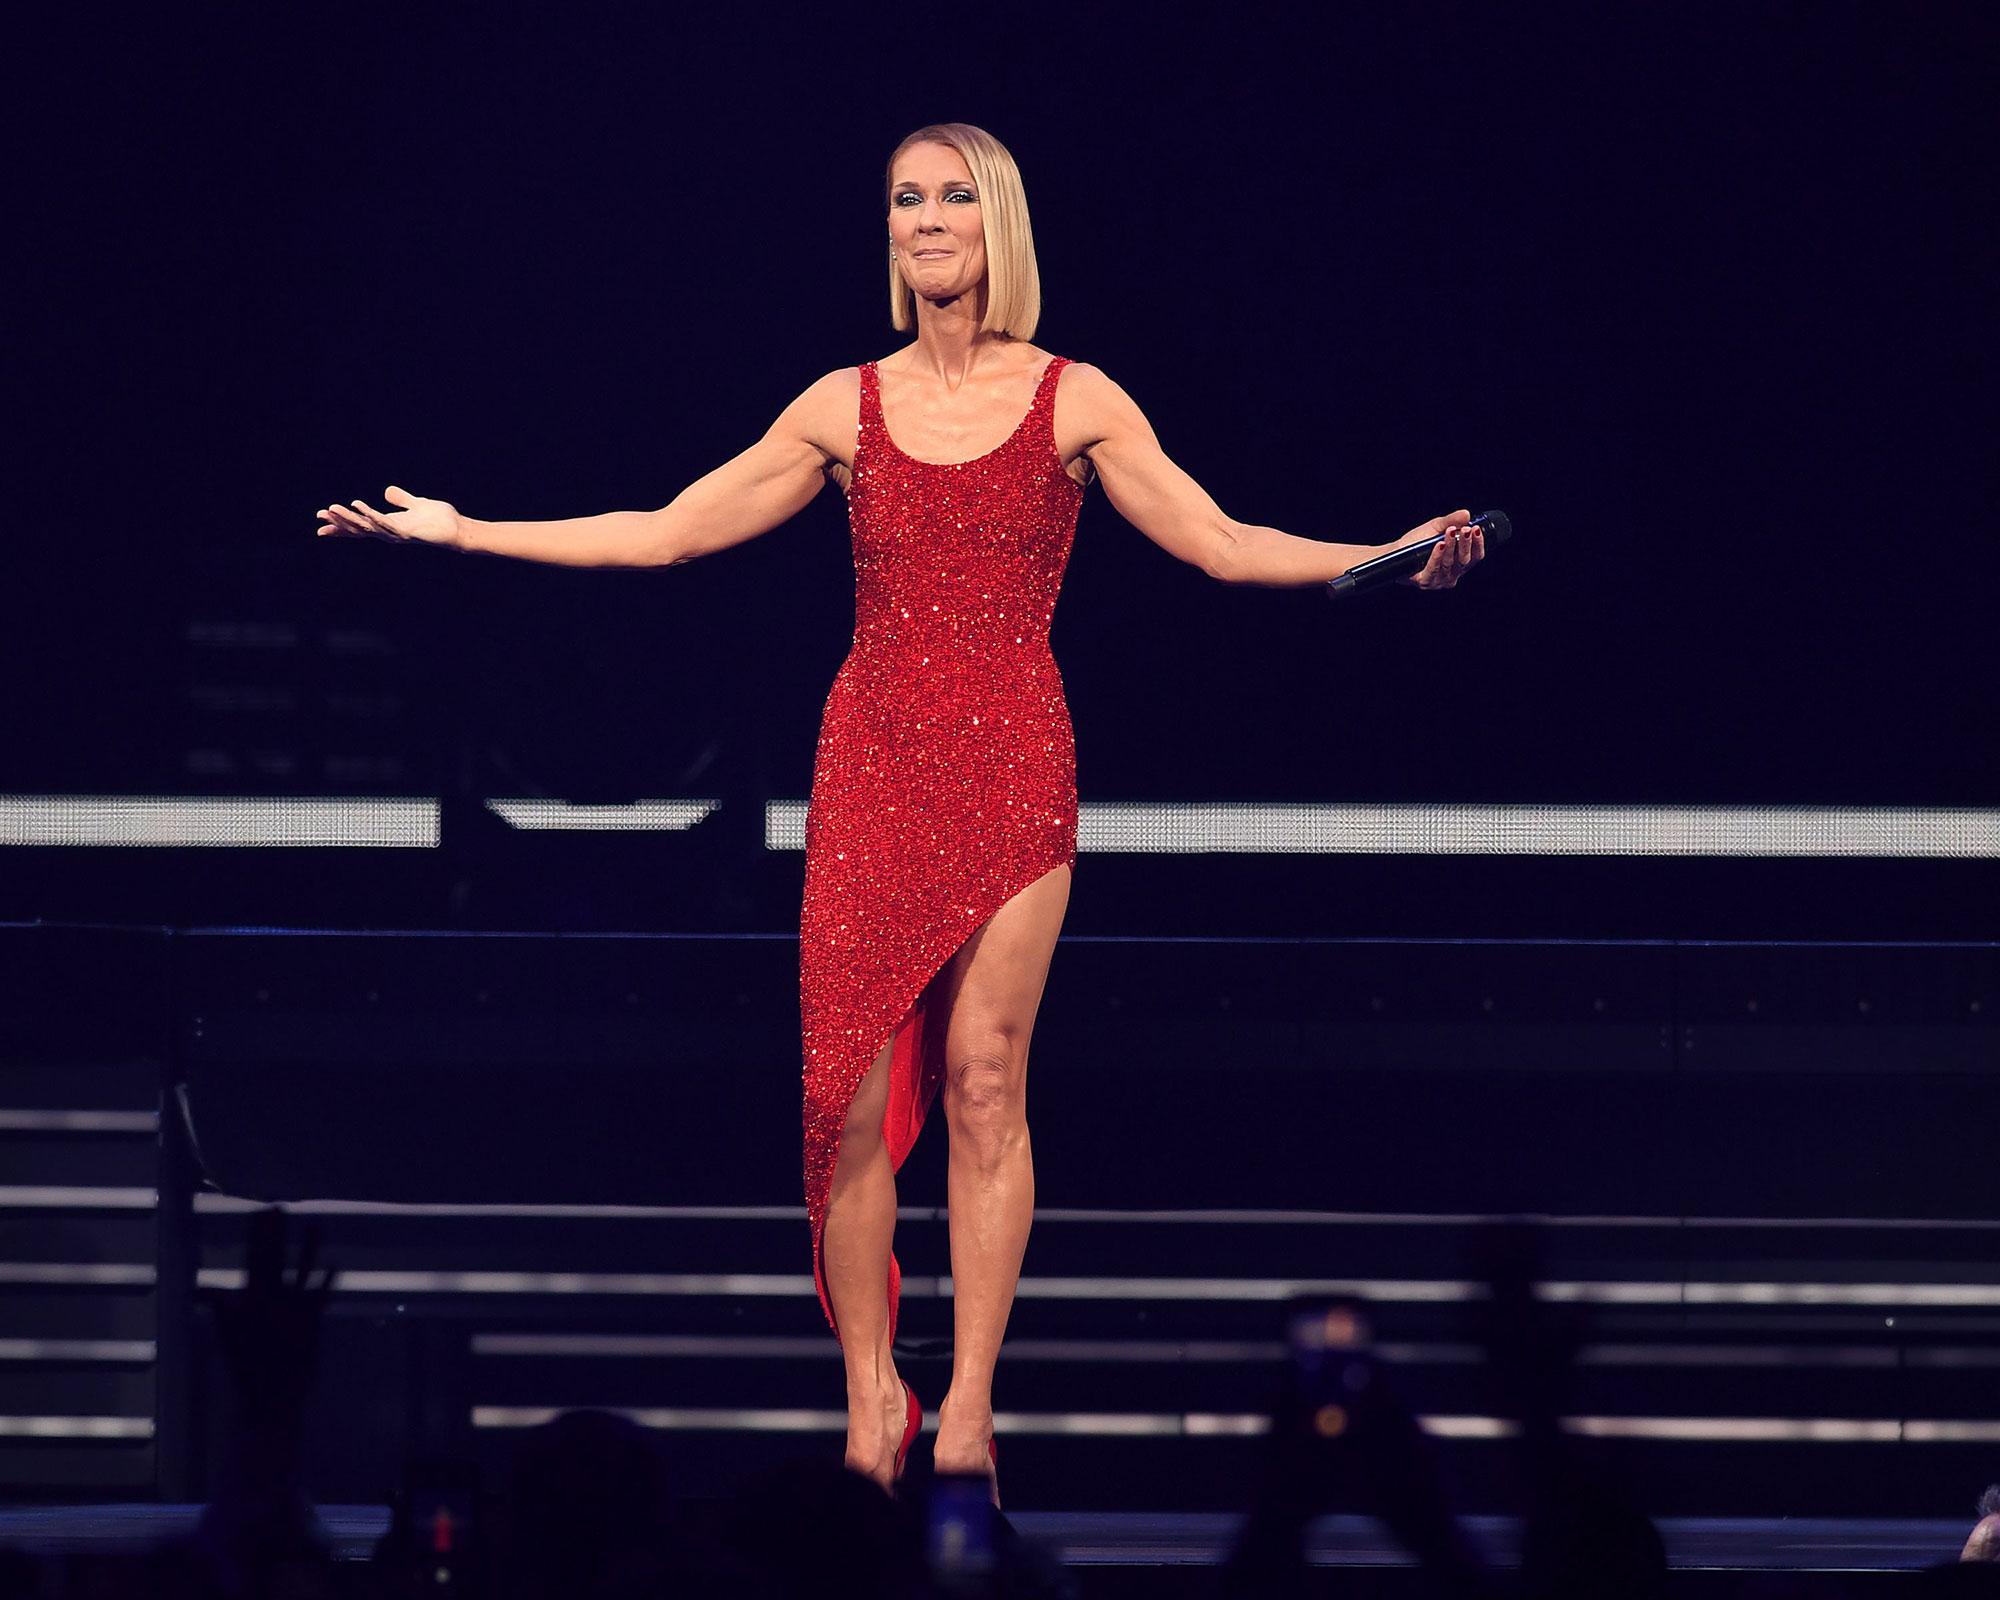 Celine Dion Delays Vegas Shows Due to 'Unforeseen Medical Symptoms'